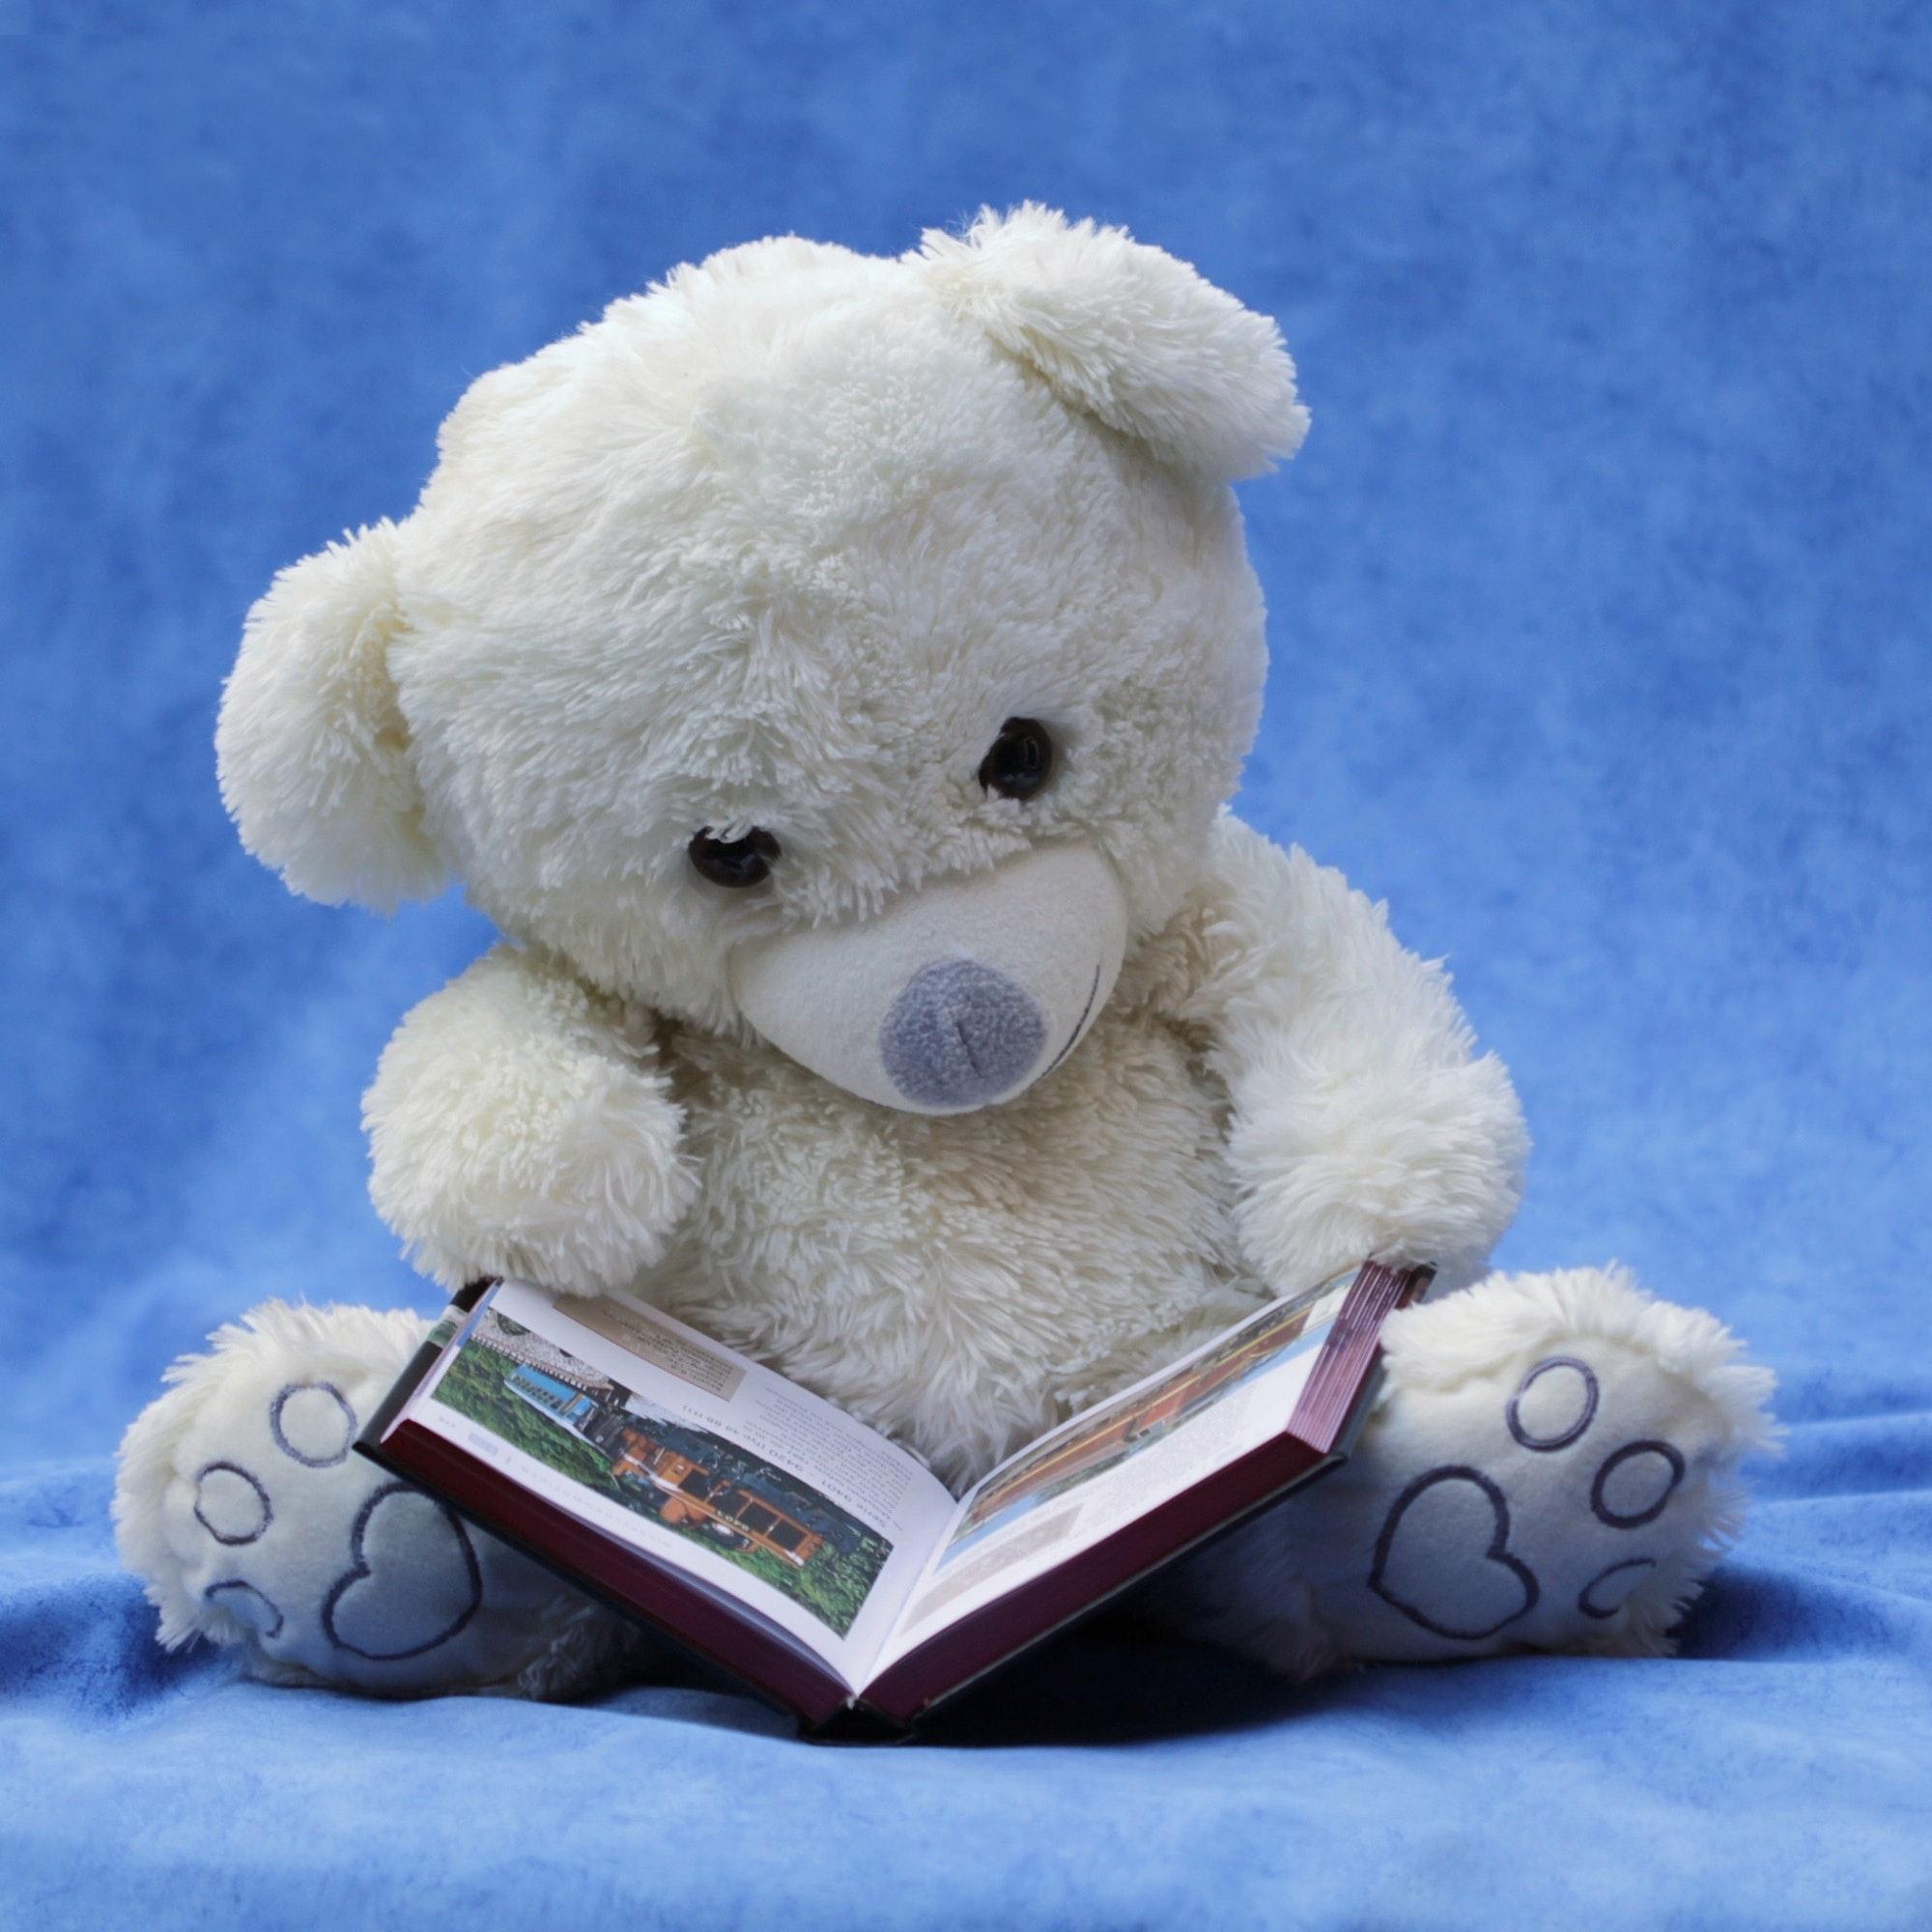 100 Interesting Teddy Bear Photos Pexels Free Stock